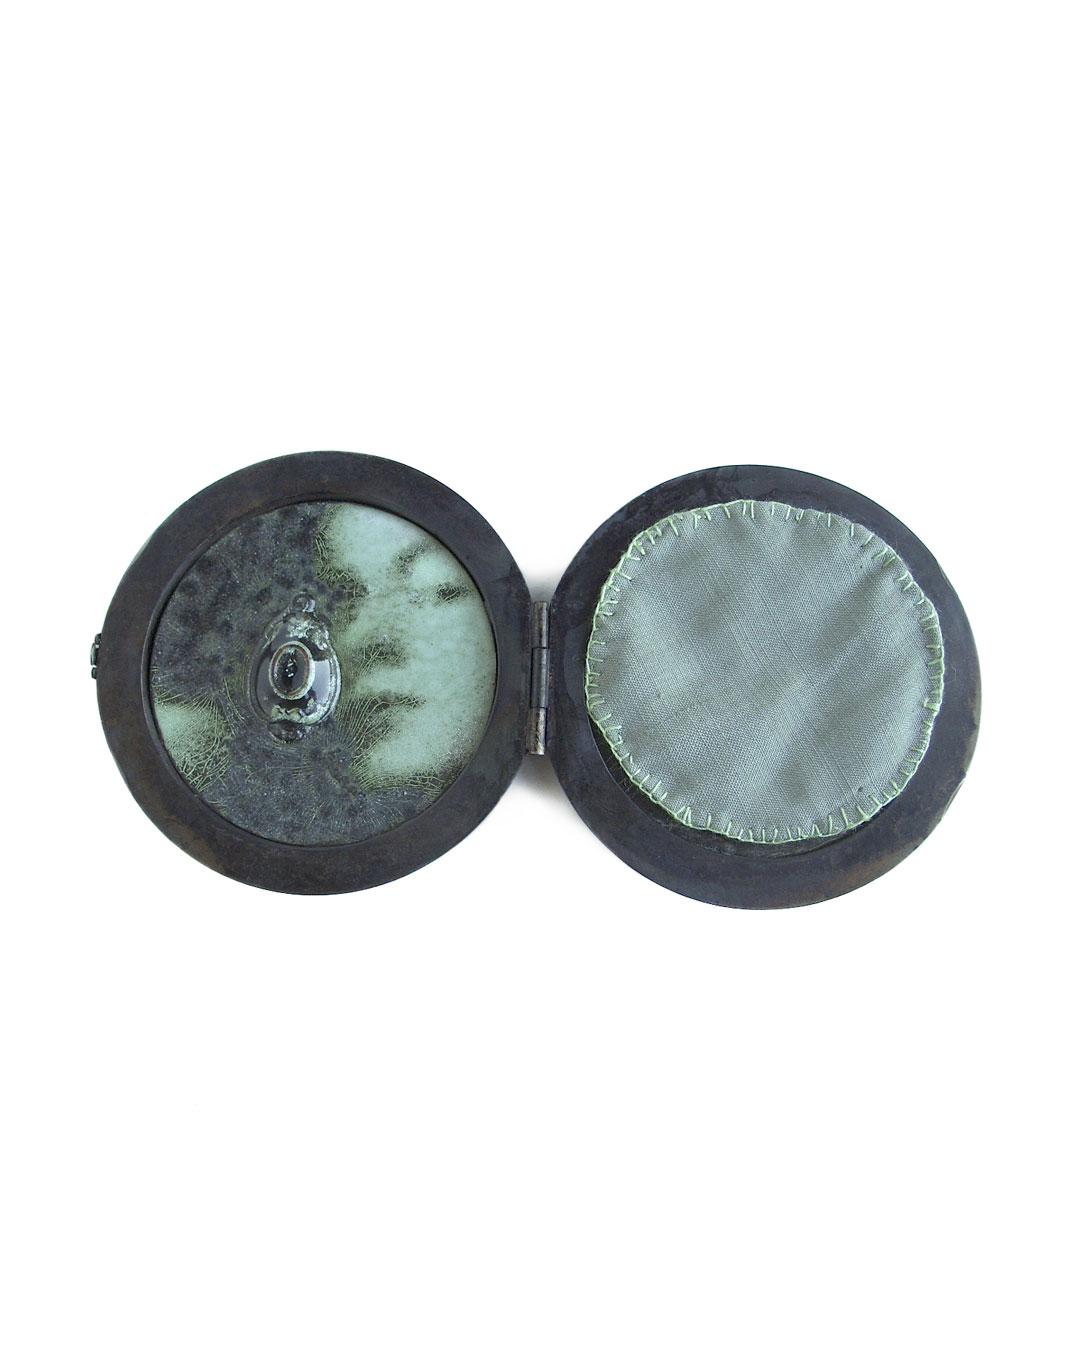 Vera Siemund, untitled, 2006, brooch; iron, enamel, copper, 130 x 65 x 10 mm (ø 65 mm), €1455